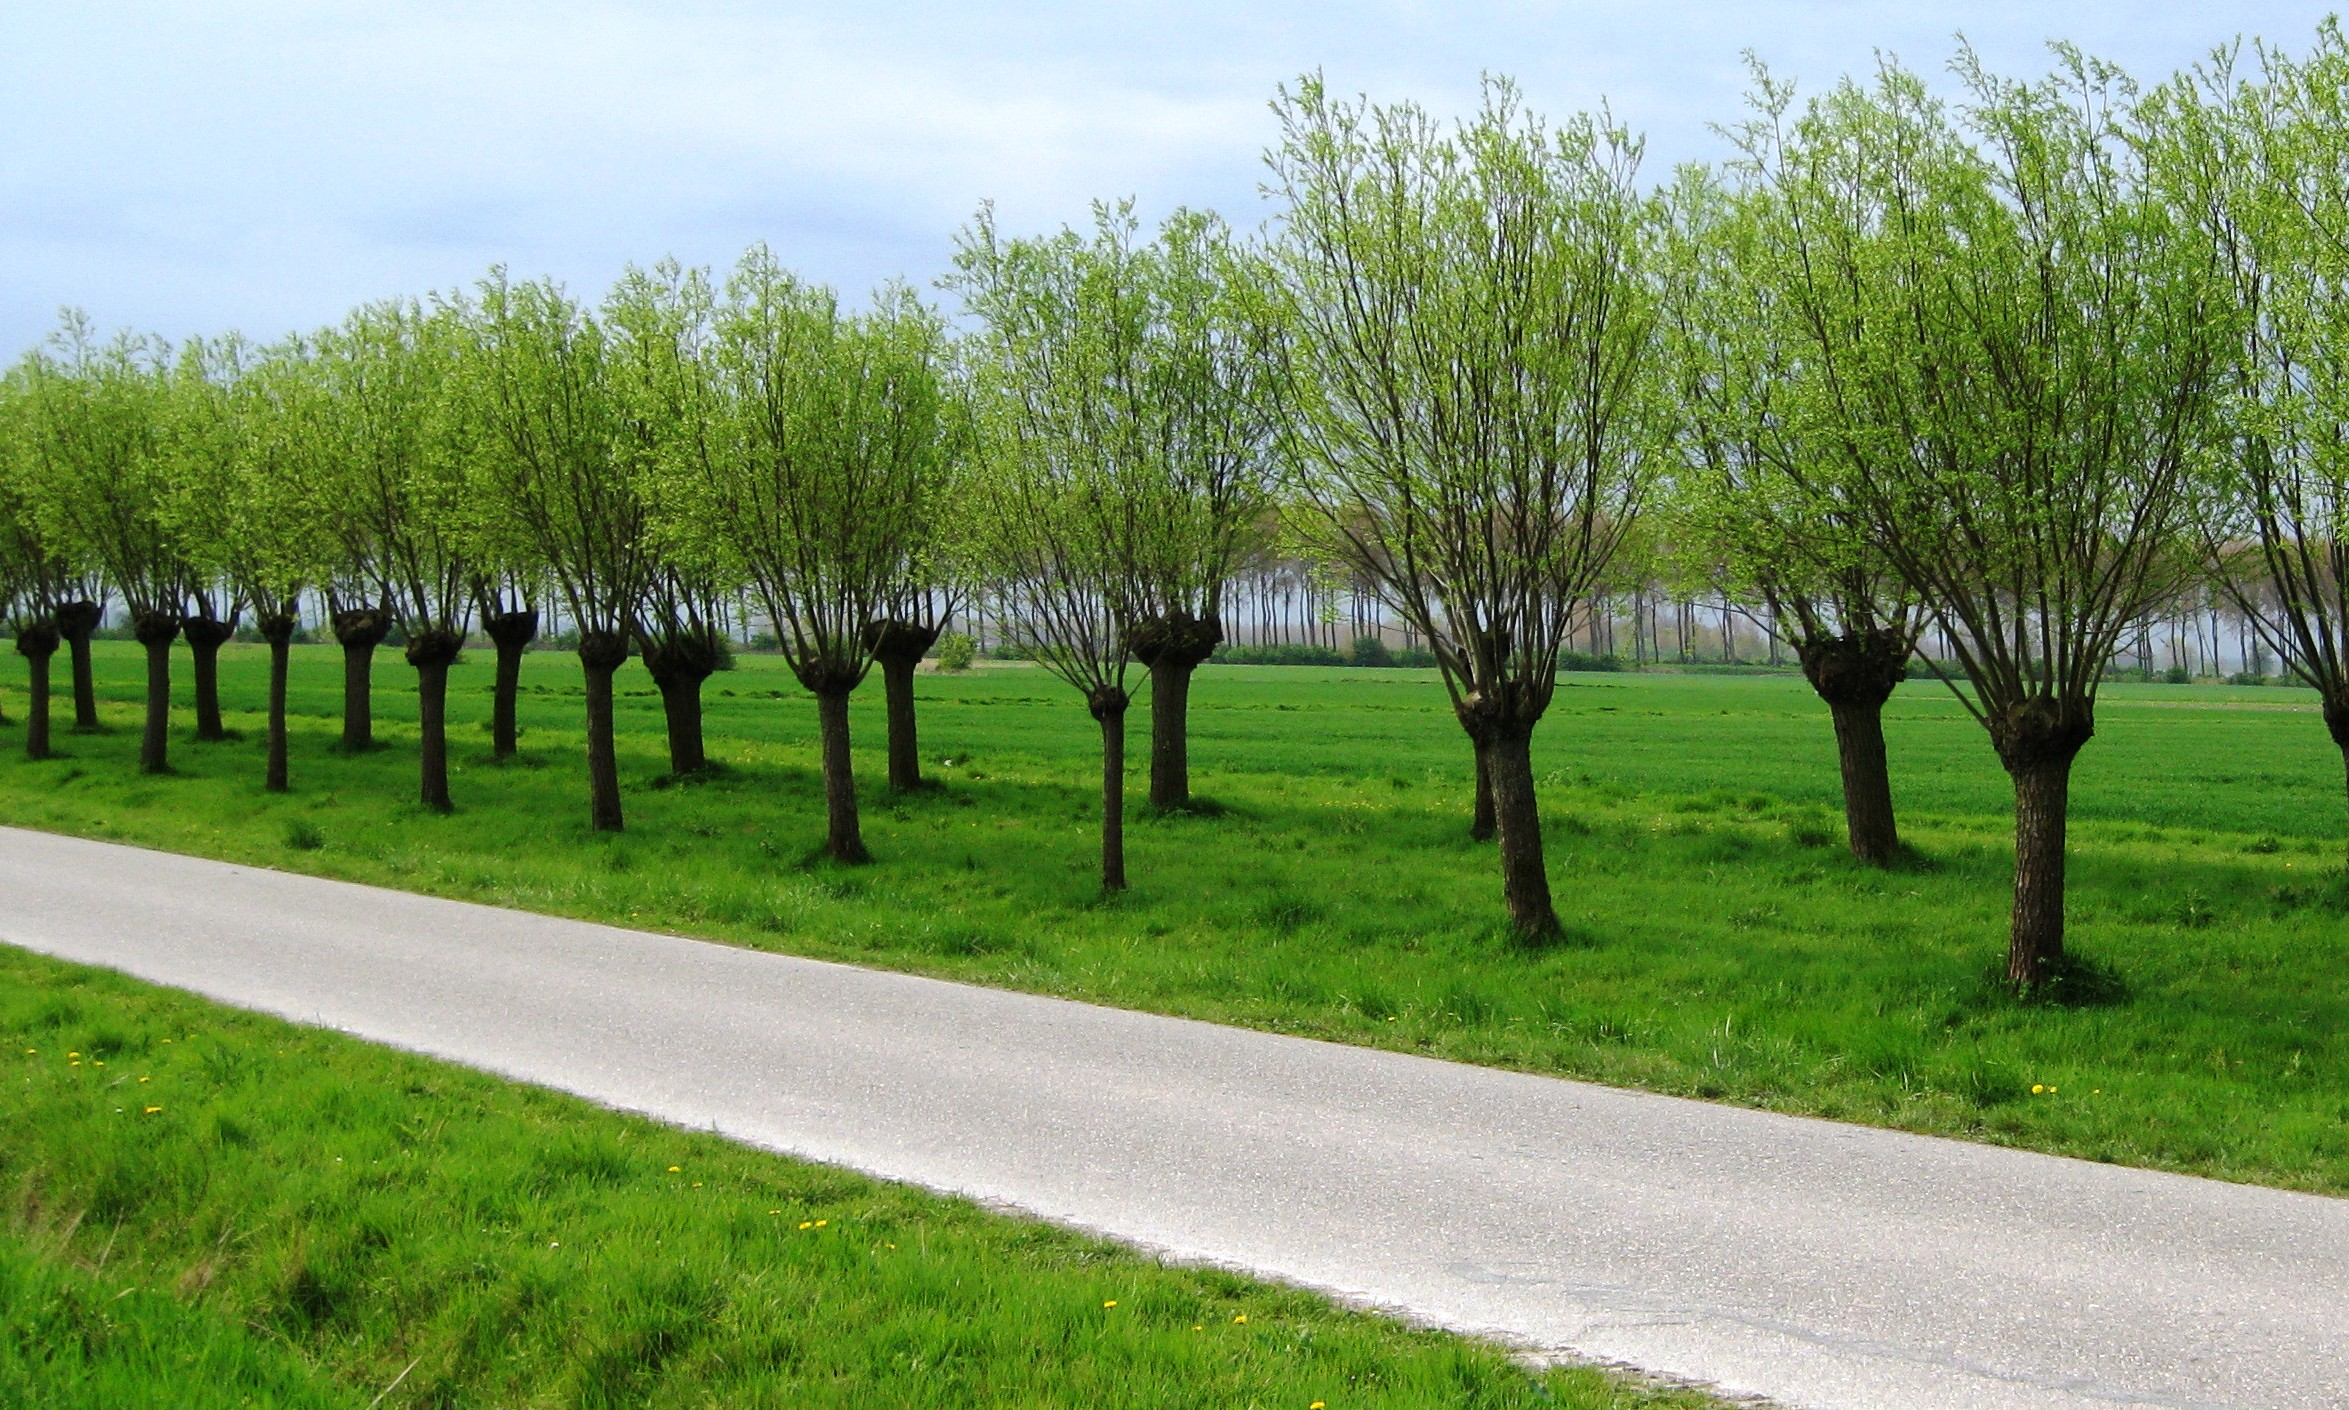 Pollard Tree Pruning Technique